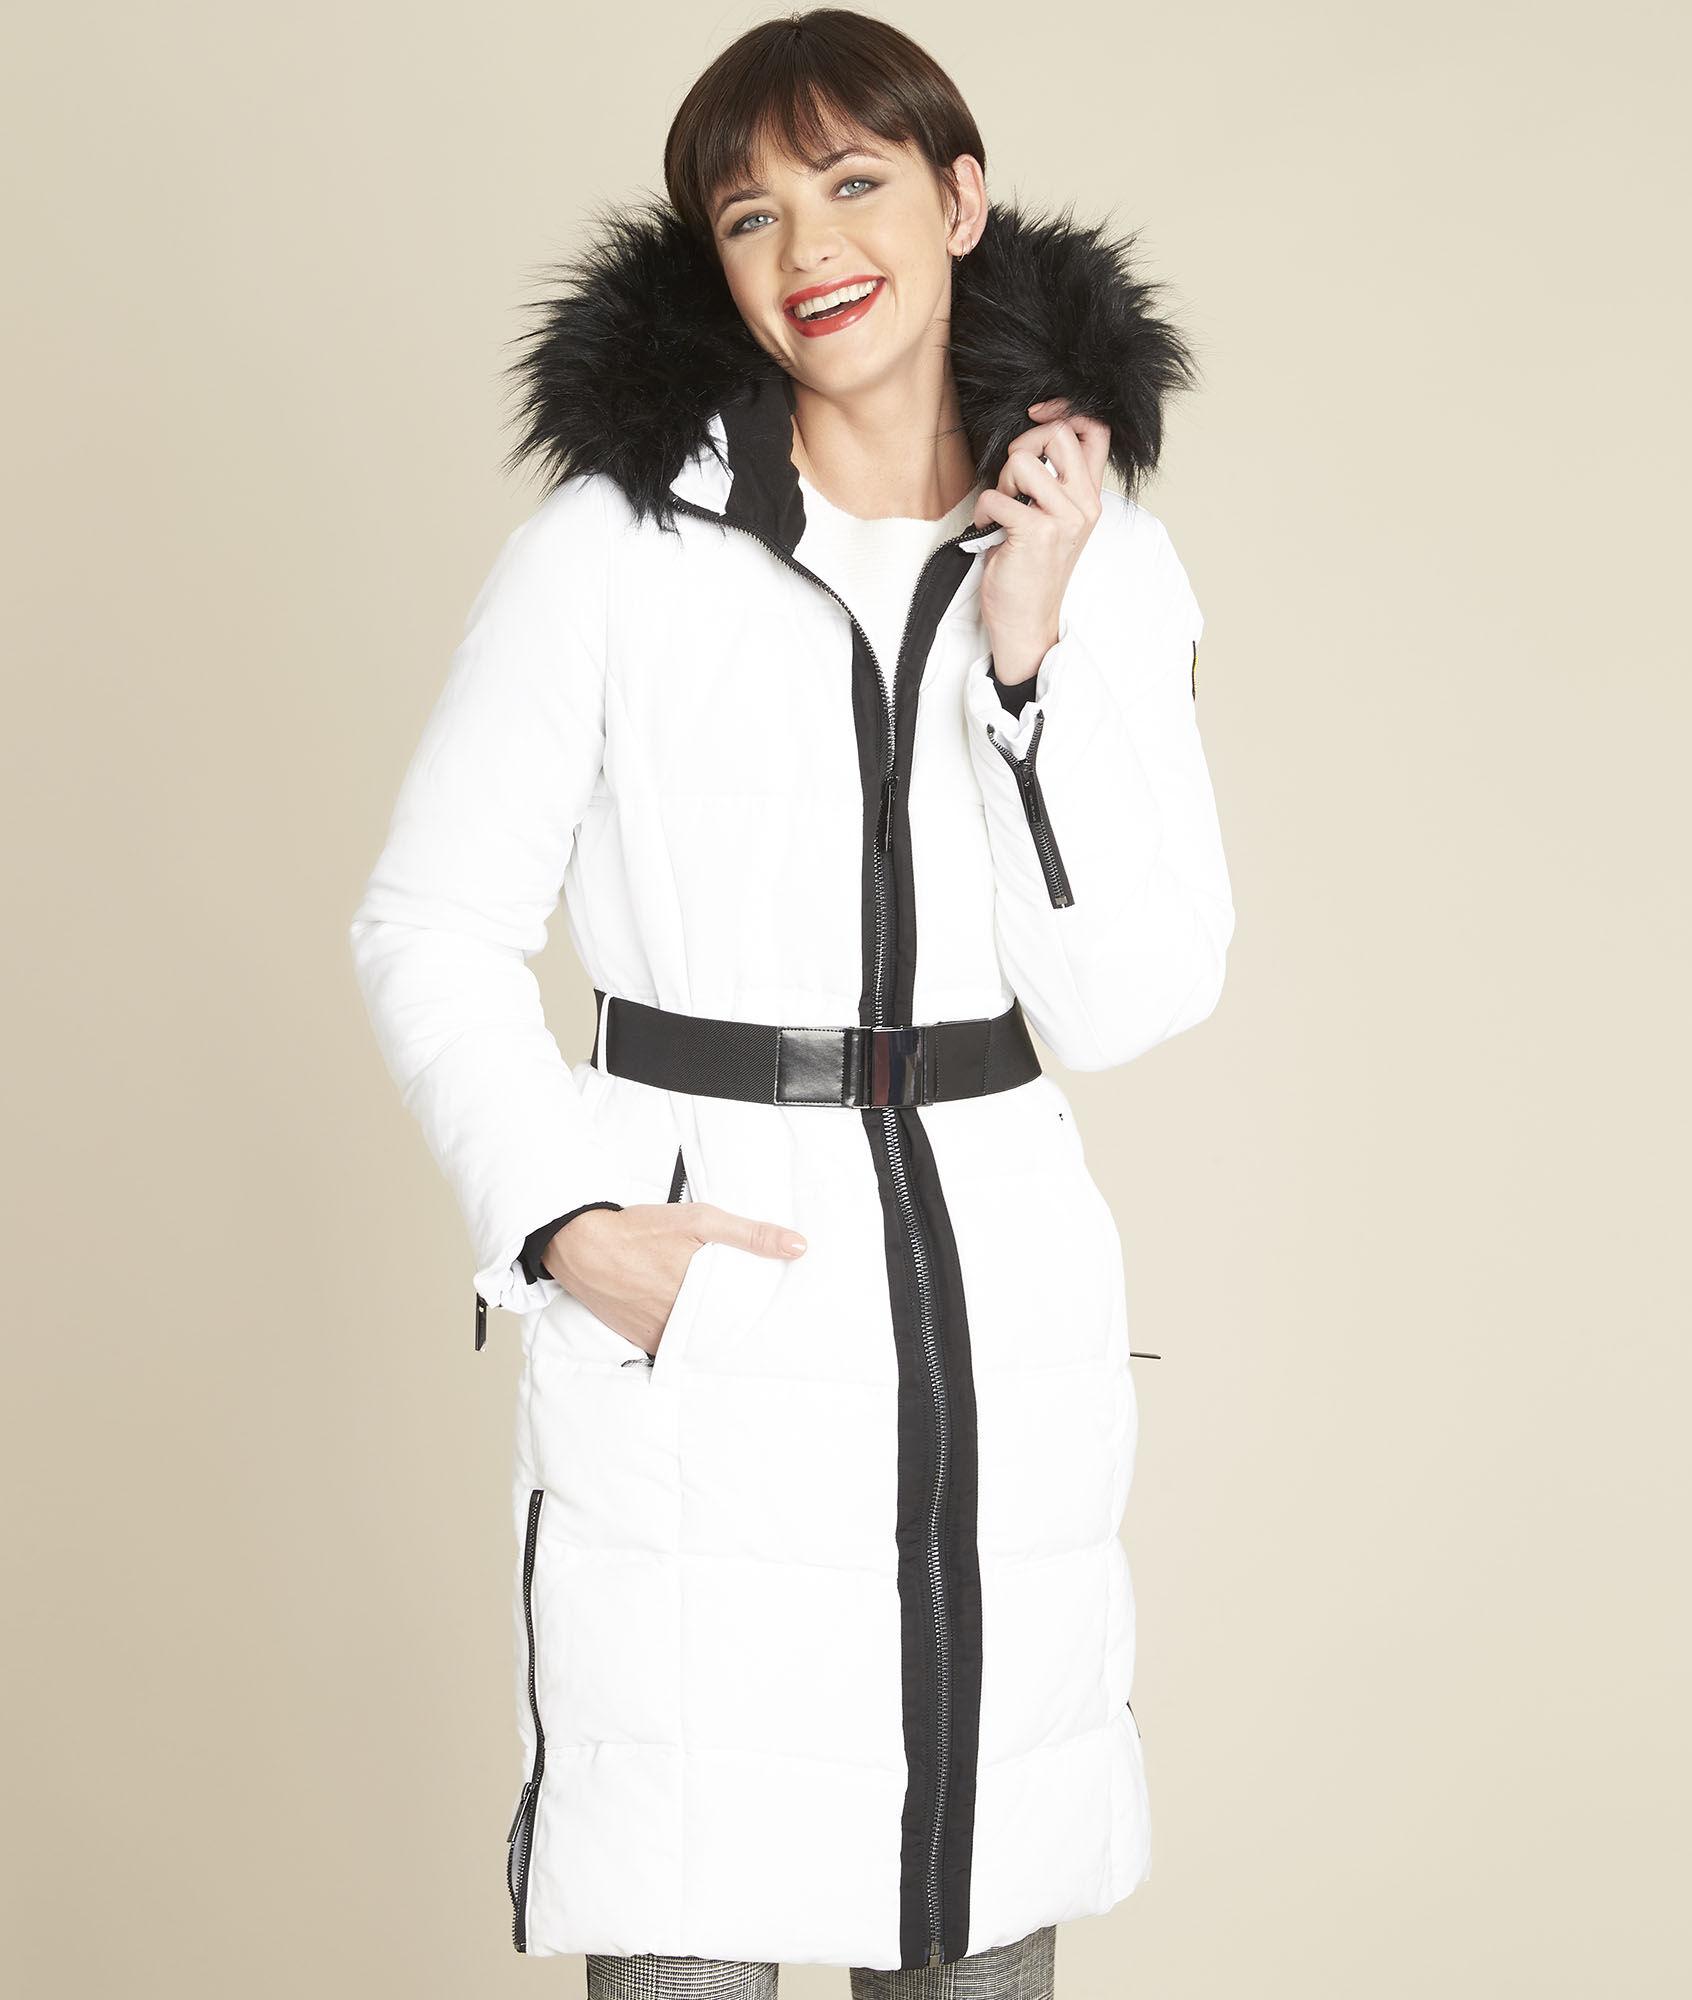 Veste blanche femme 123